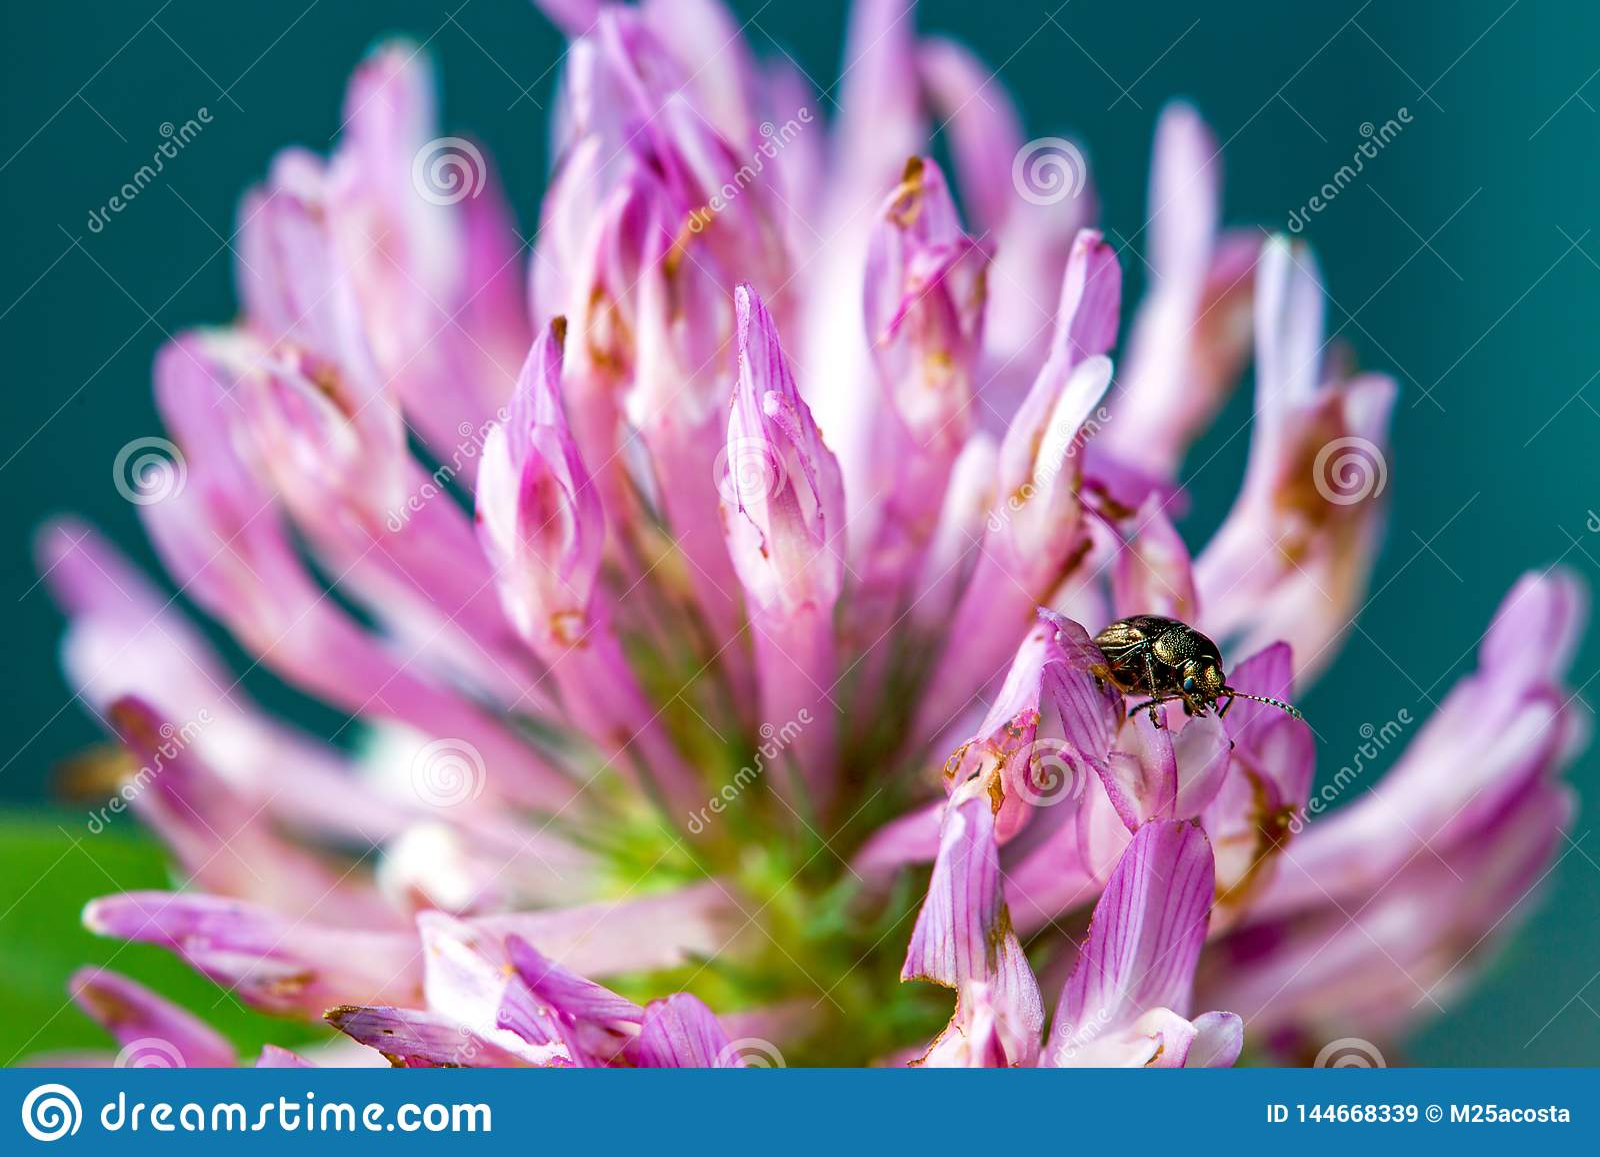 Brown ladybug walking on a red clover flower